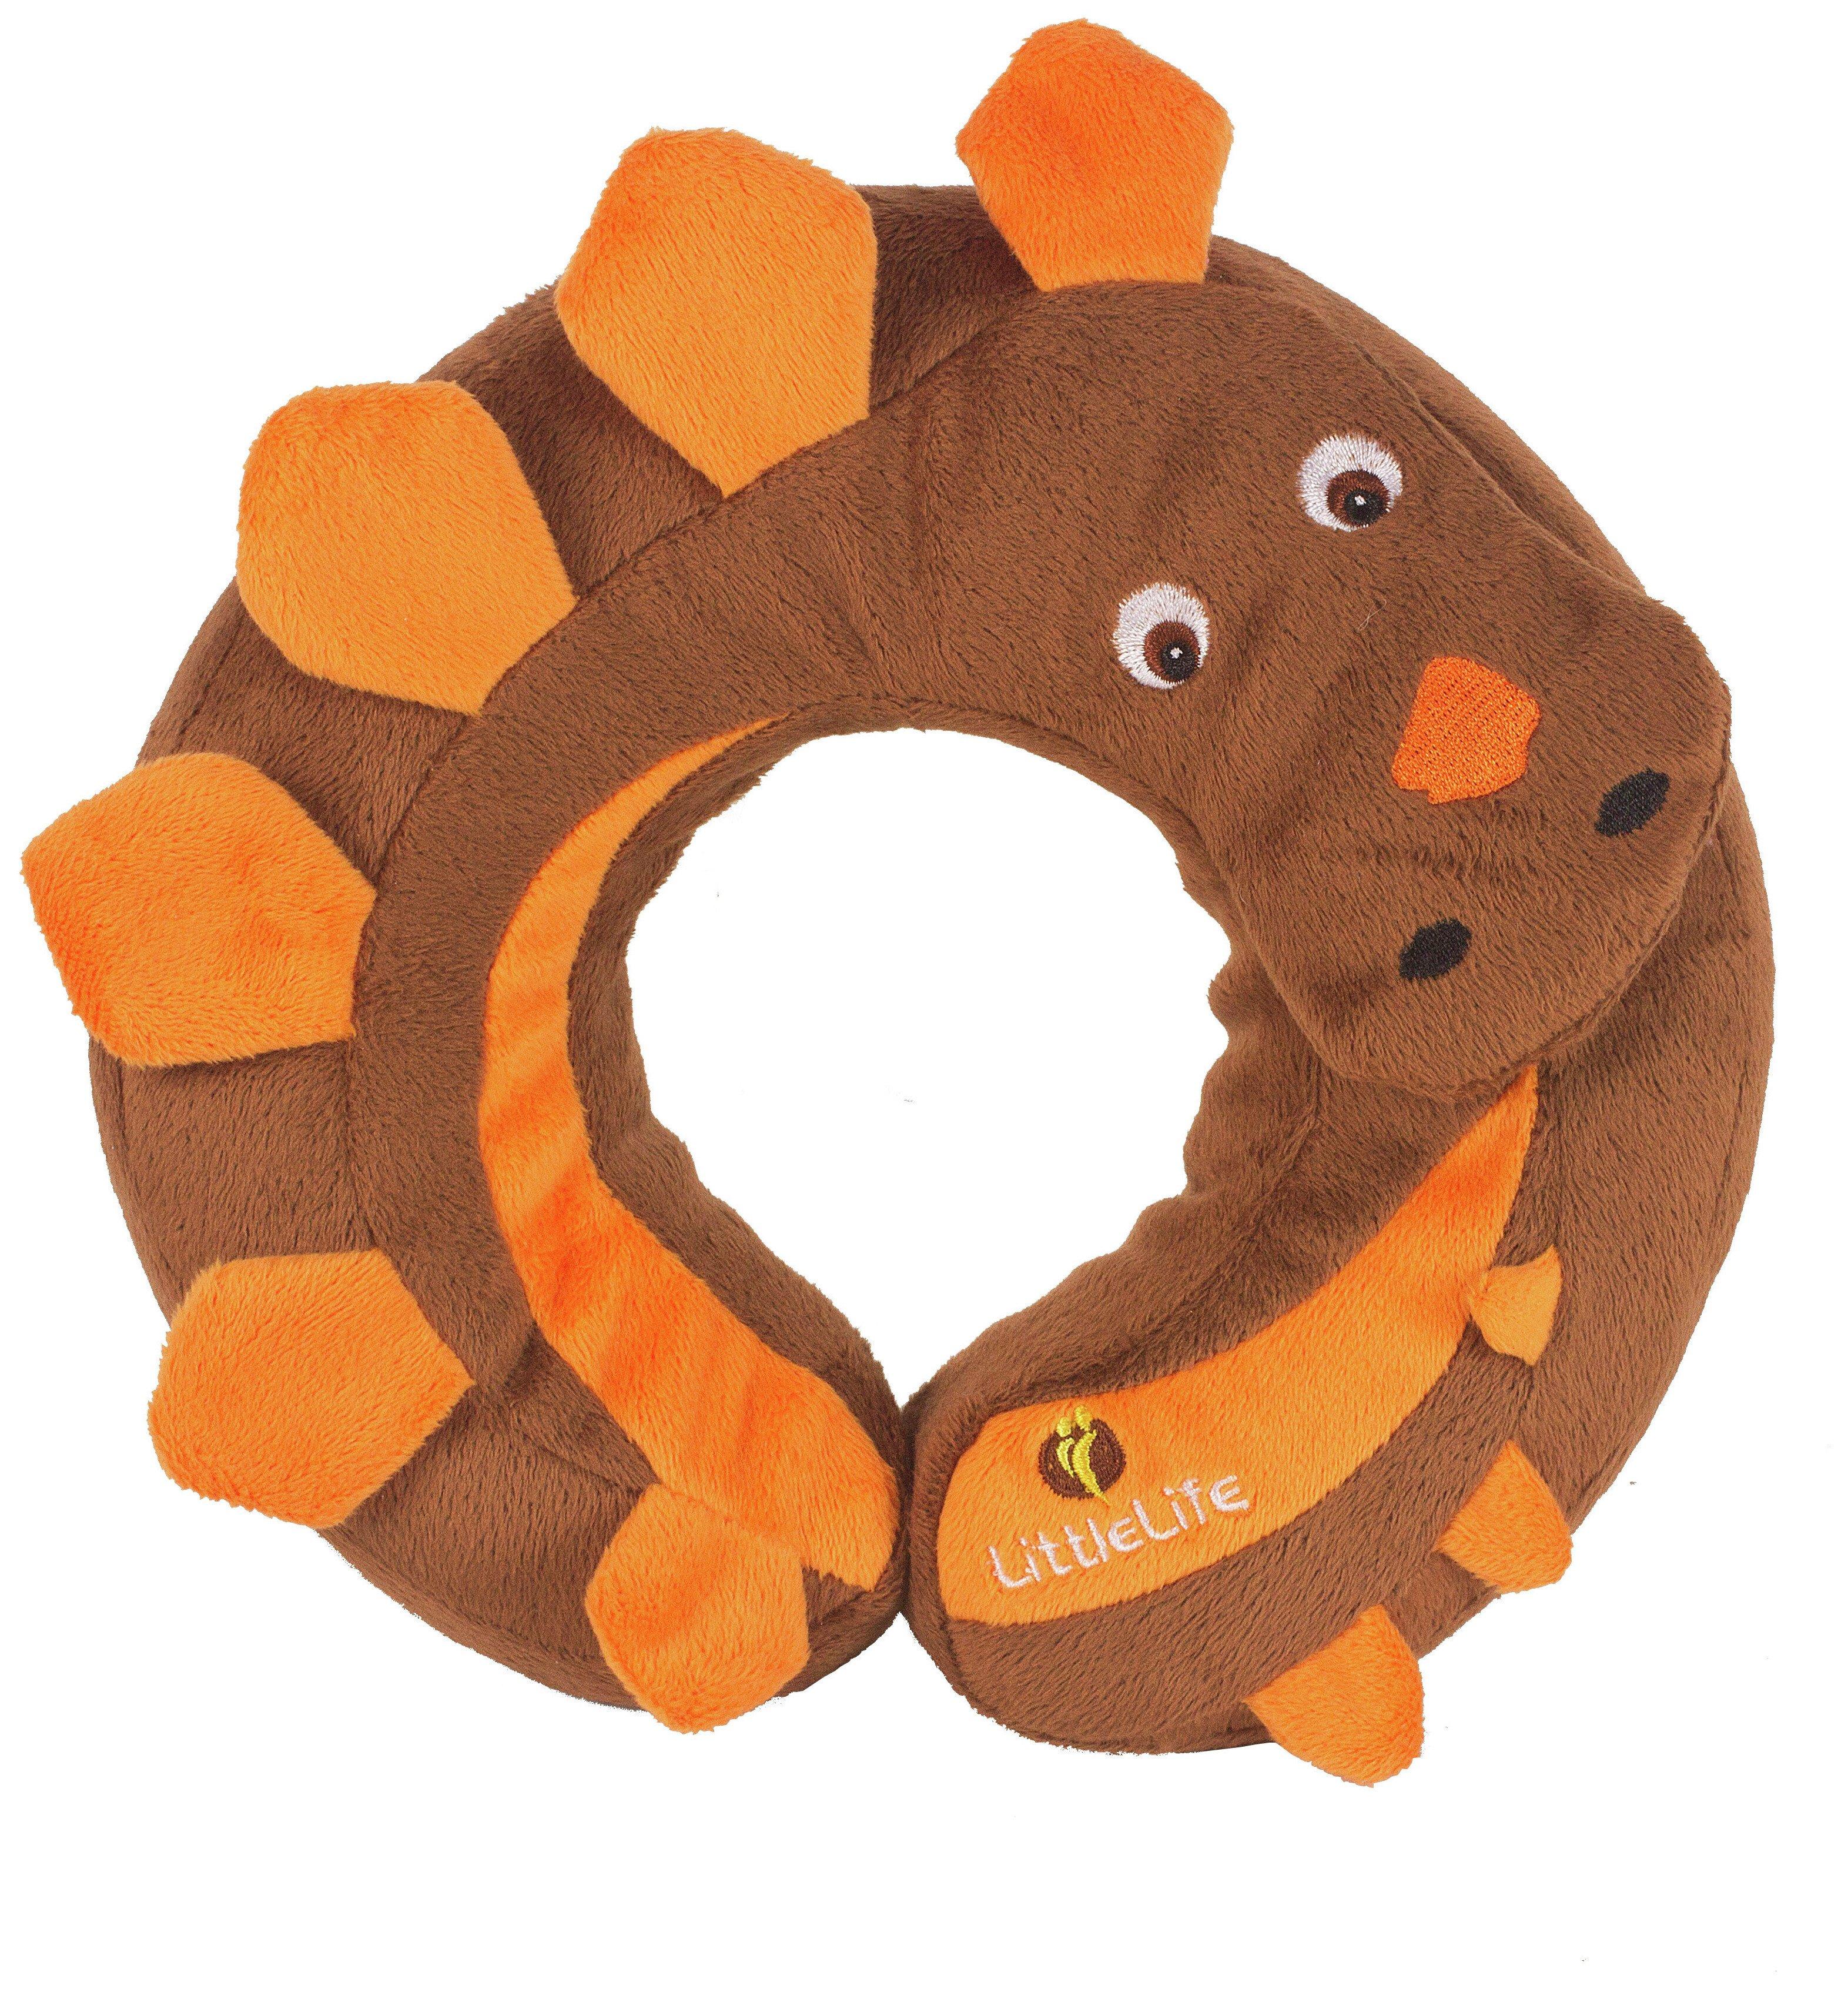 Littlelife Animal Snooze Pillow - Dinosaur